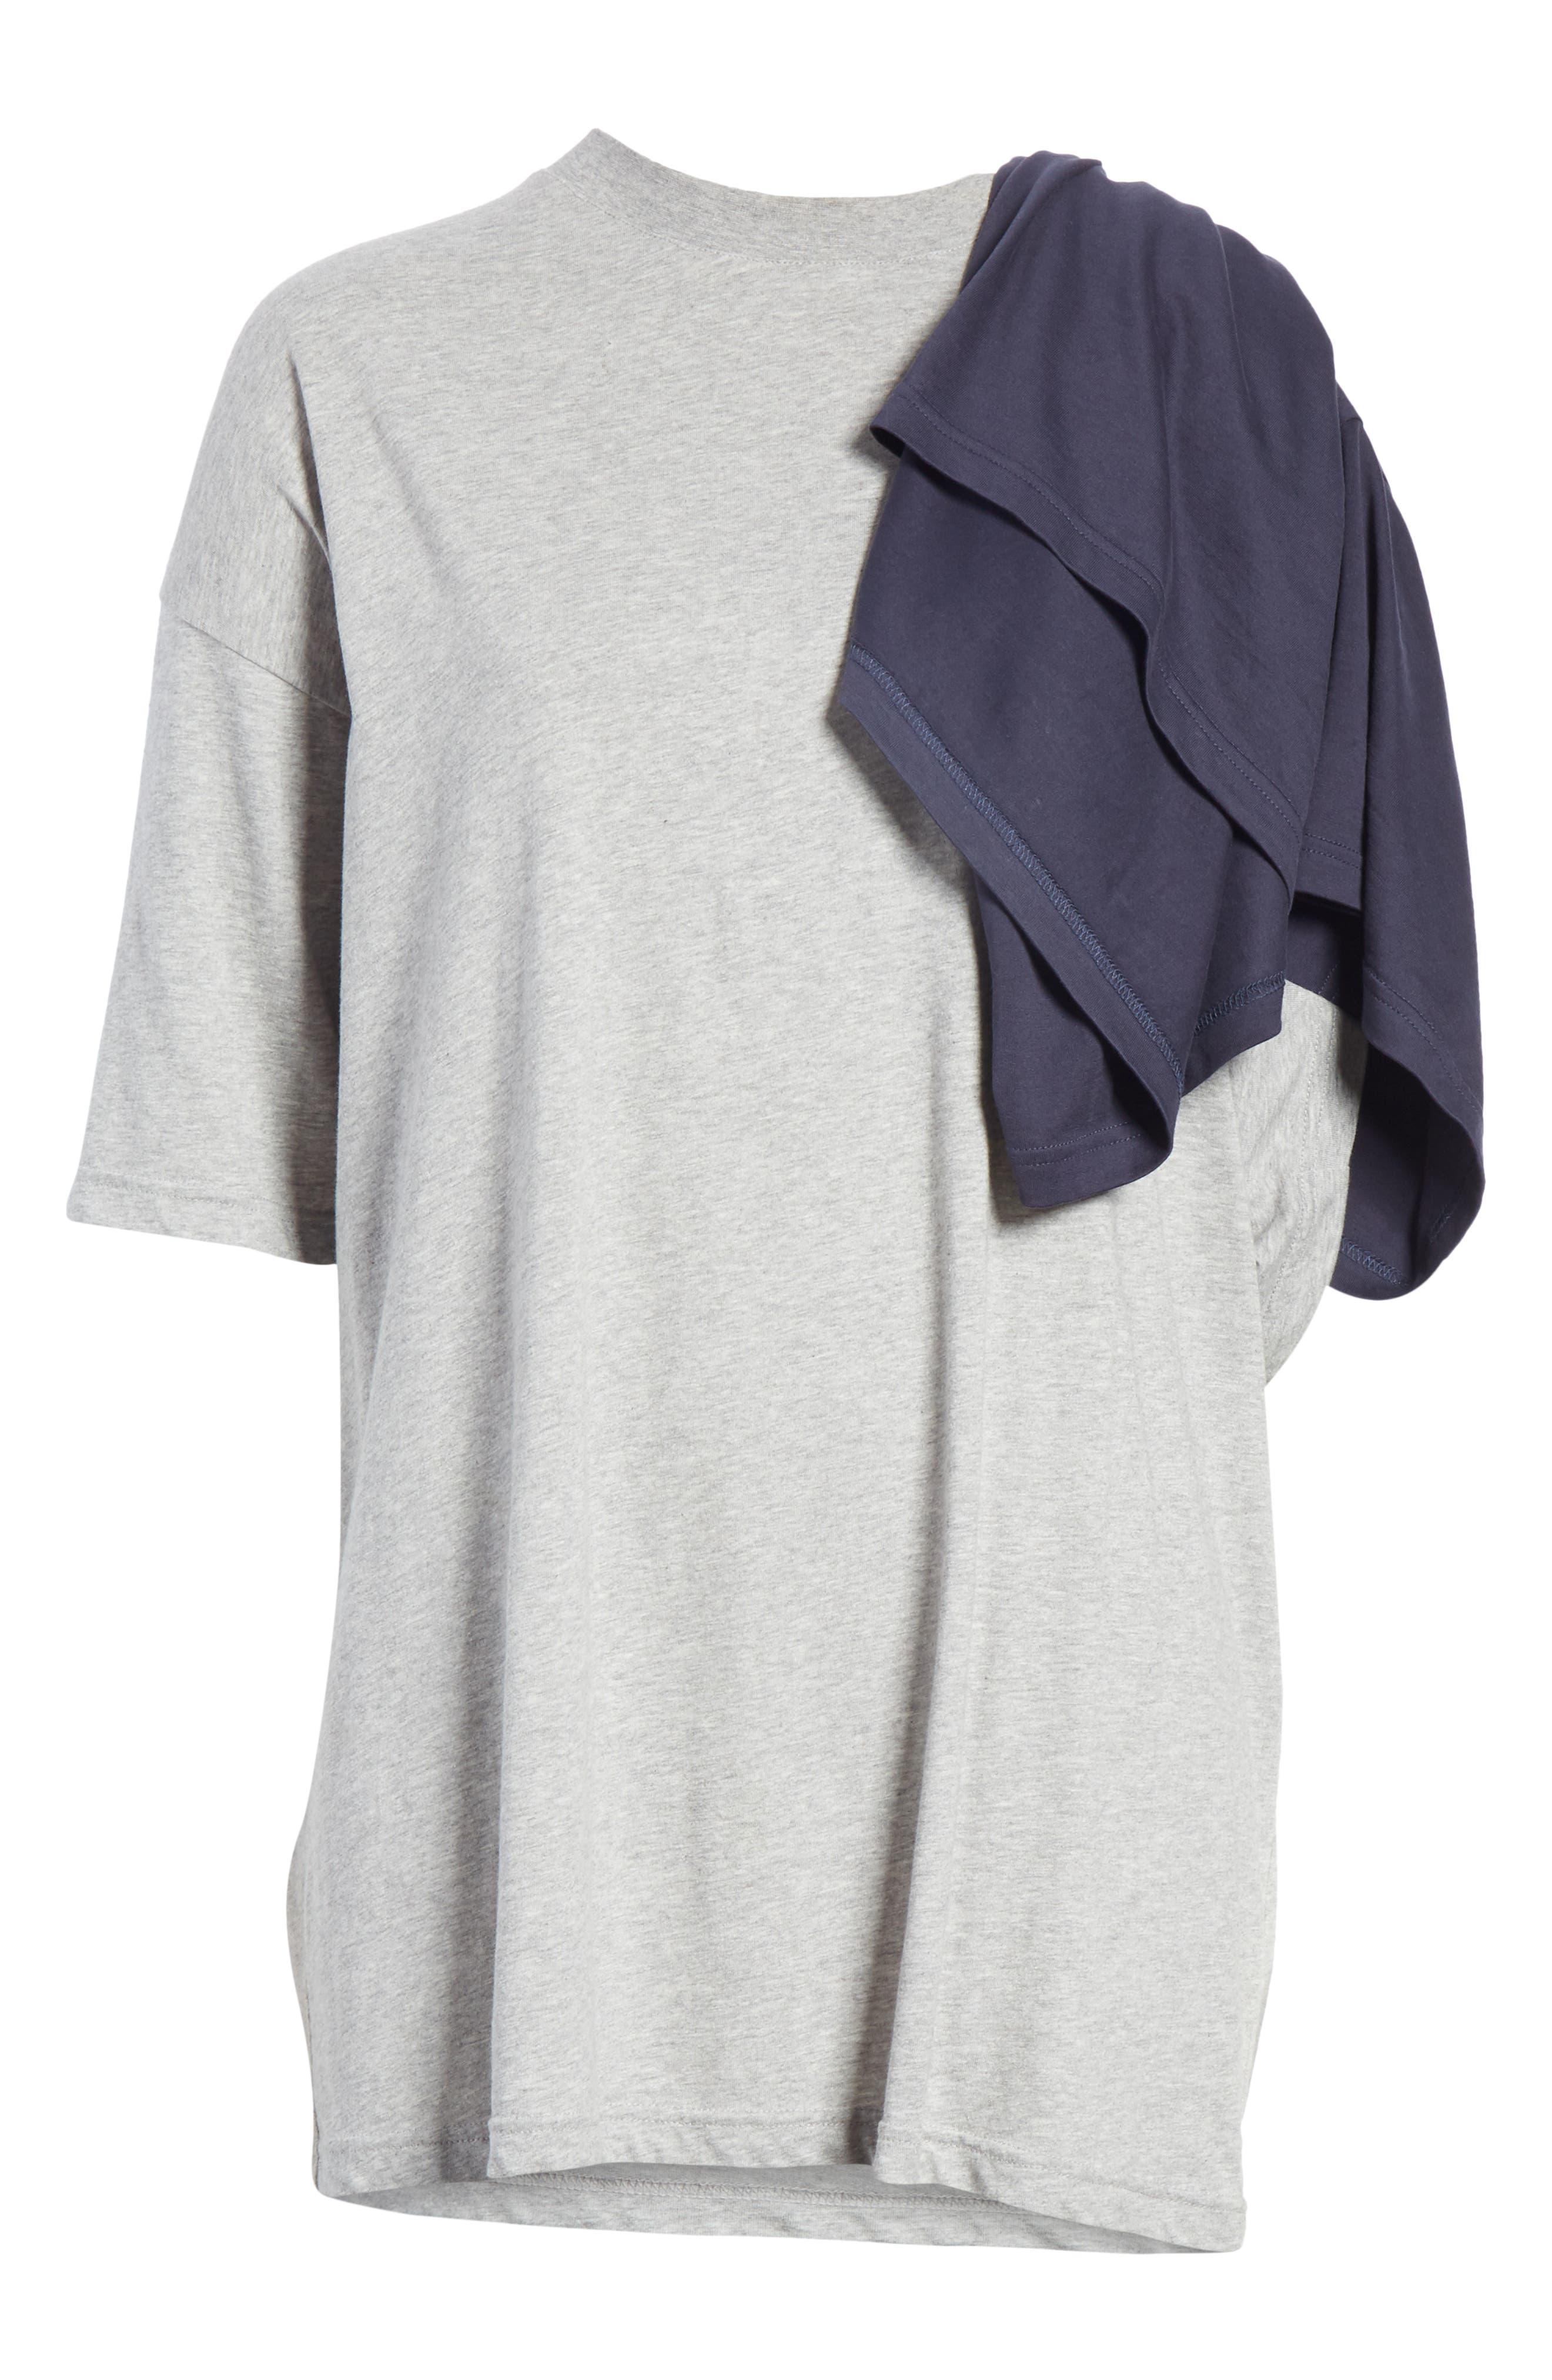 Doubled Short Sleeve Tee,                             Alternate thumbnail 7, color,                             GRCHINE/ NAVY